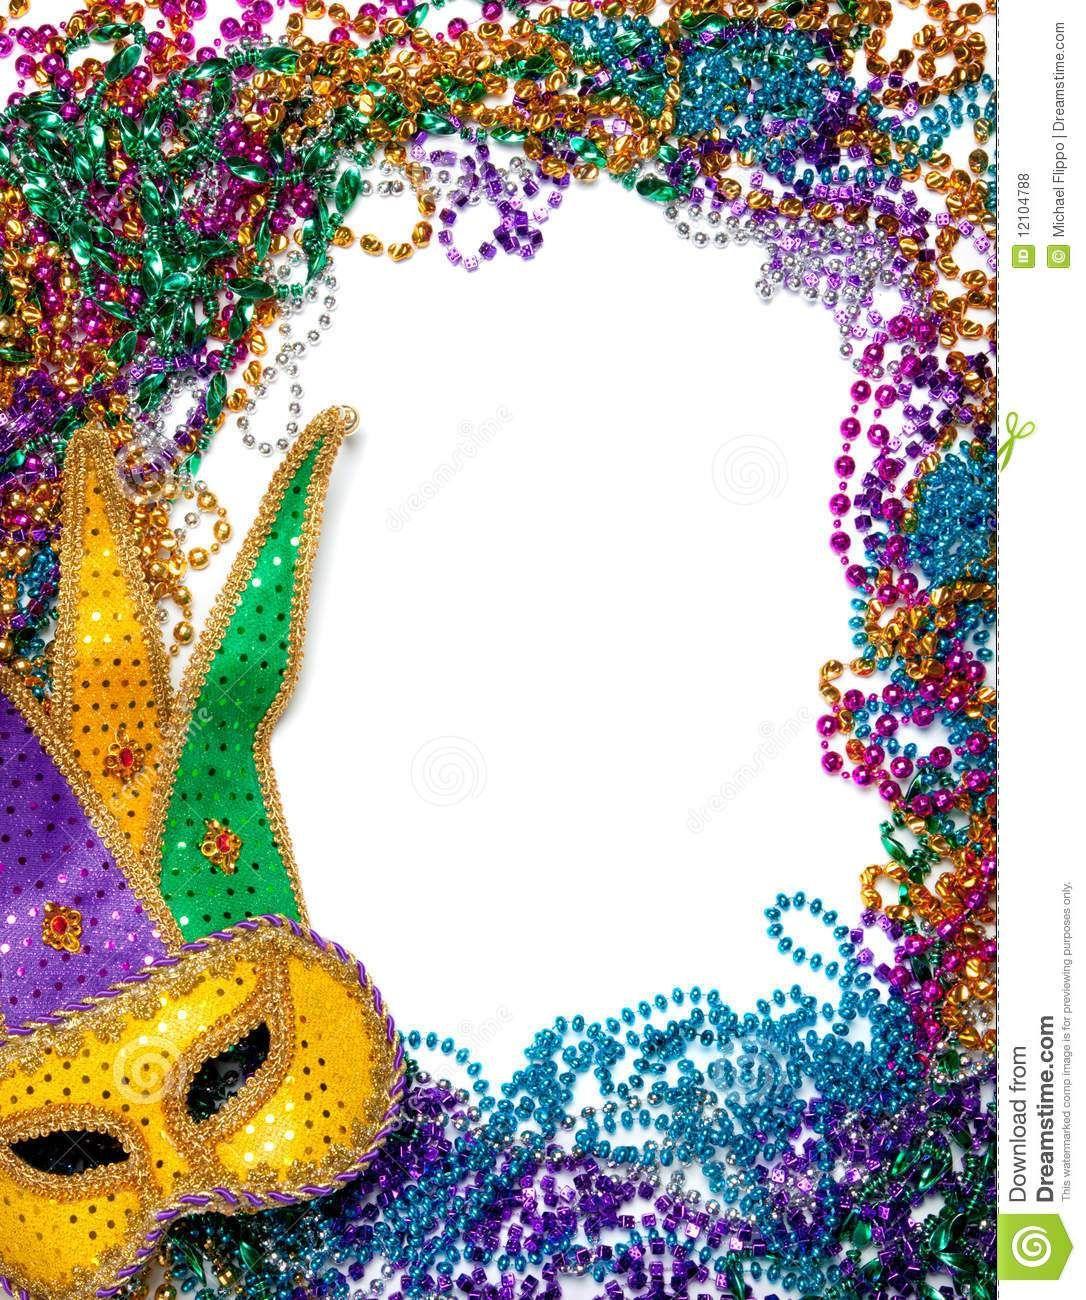 Free Printable Mardi Gras Borders. Royalty Free Stock Photos.